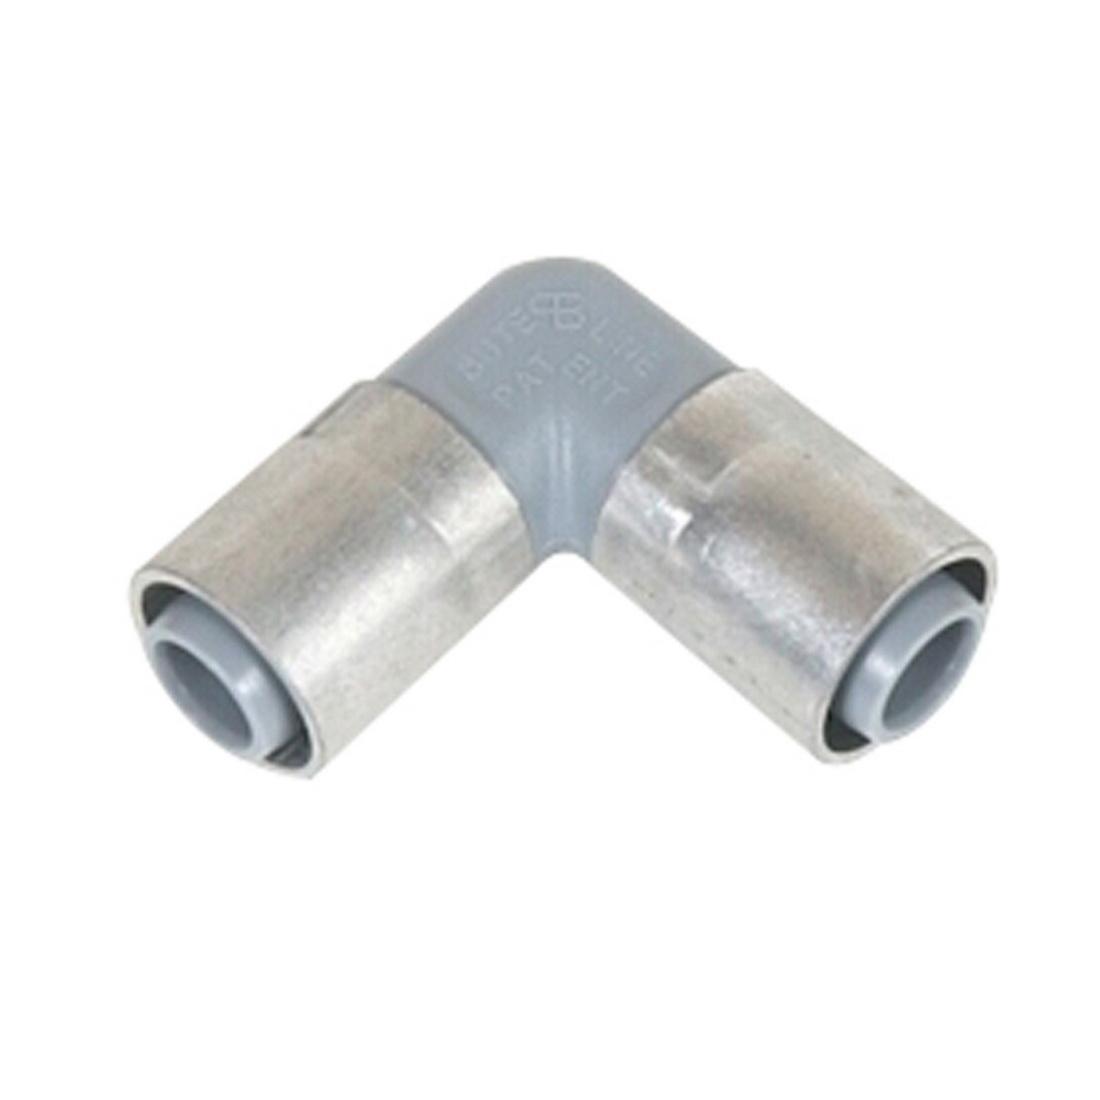 Buteline Equal Elbow 15 x 15 mm 90 deg E15